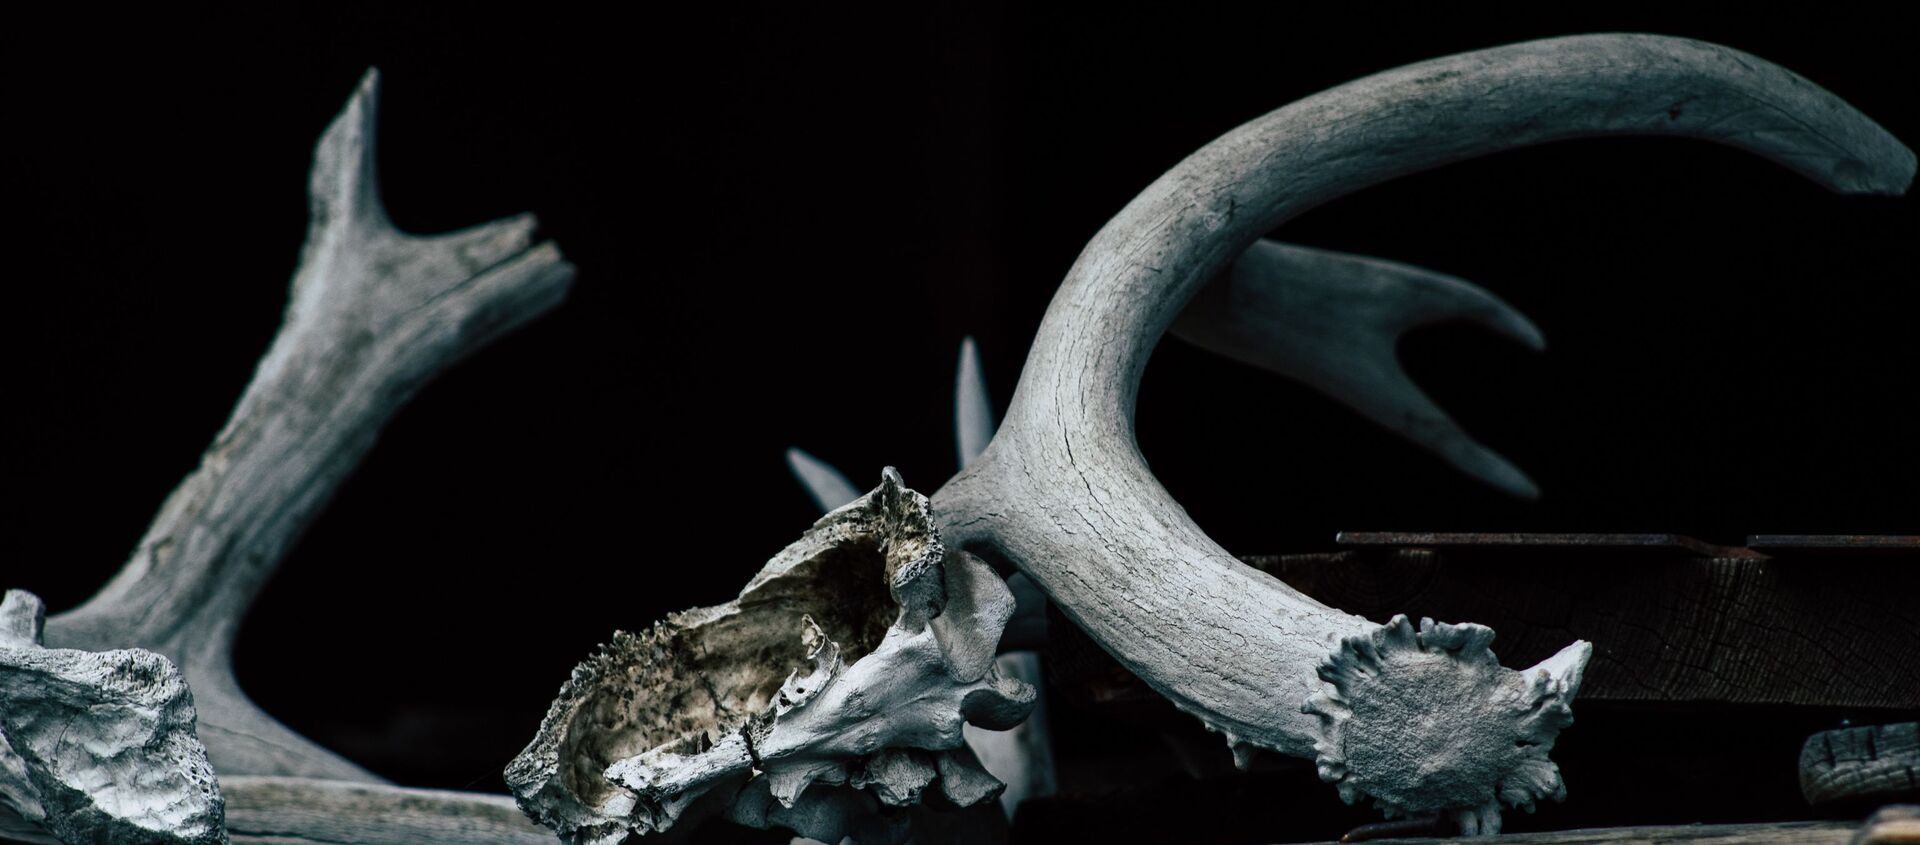 Кость динозавра. Иллюстративное фото - Sputnik Узбекистан, 1920, 25.02.2021